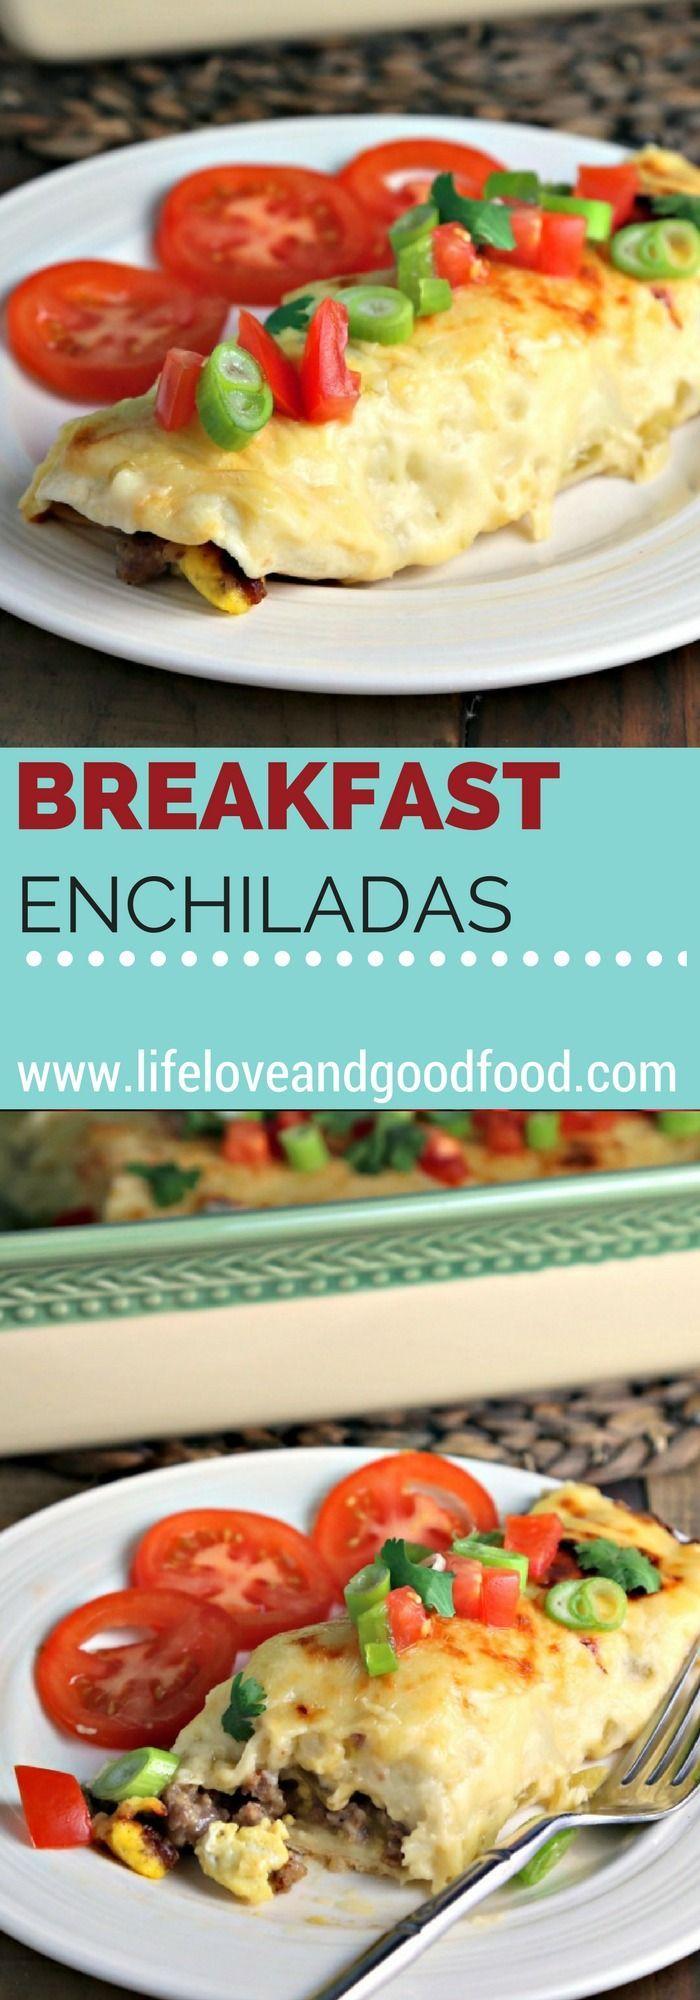 Breakfast Enchiladas | Life, Love, and Good Food #casserole #recipe http://lifeloveandgoodfood.com/breakfast-enchiladas/